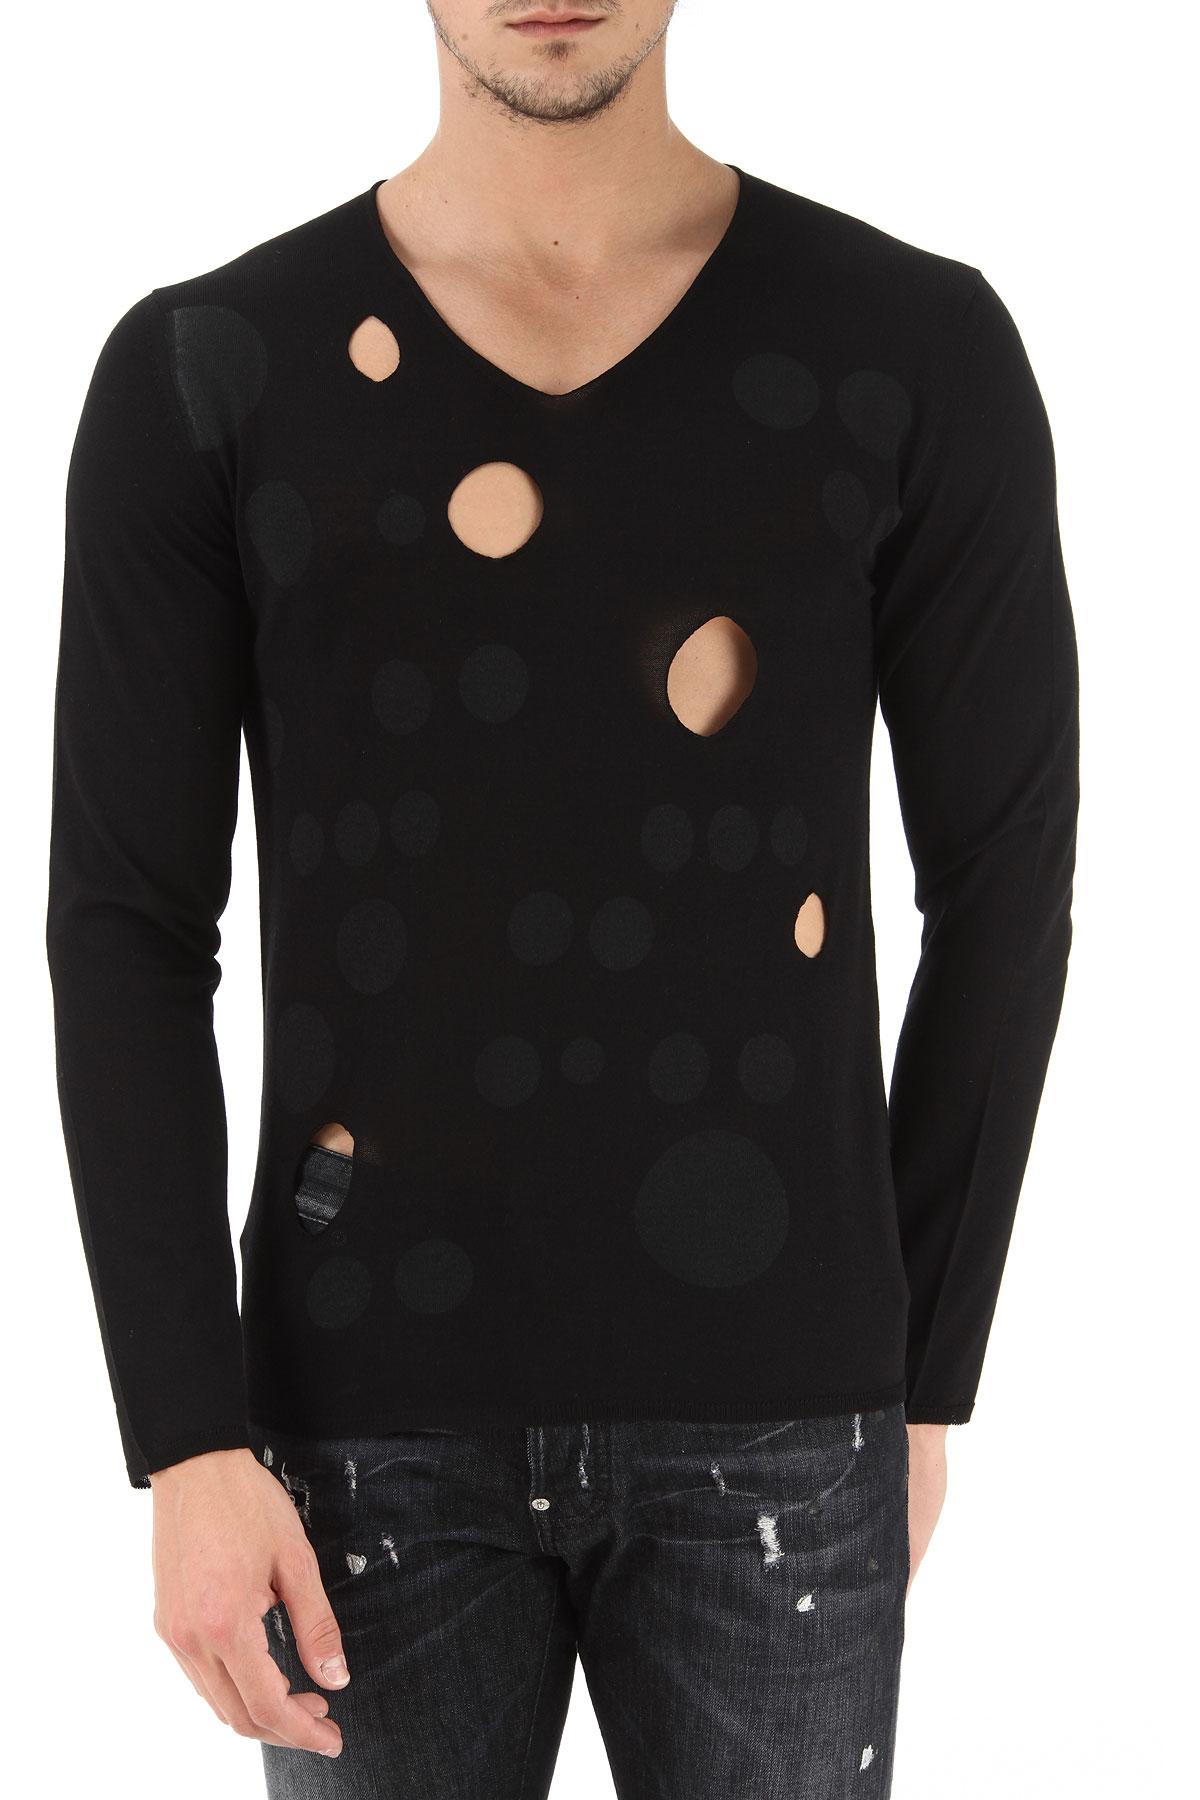 Comme des Garcons Sweater for Men Jumper On Sale, Black, Wool, 2017, L S XL USA-359497